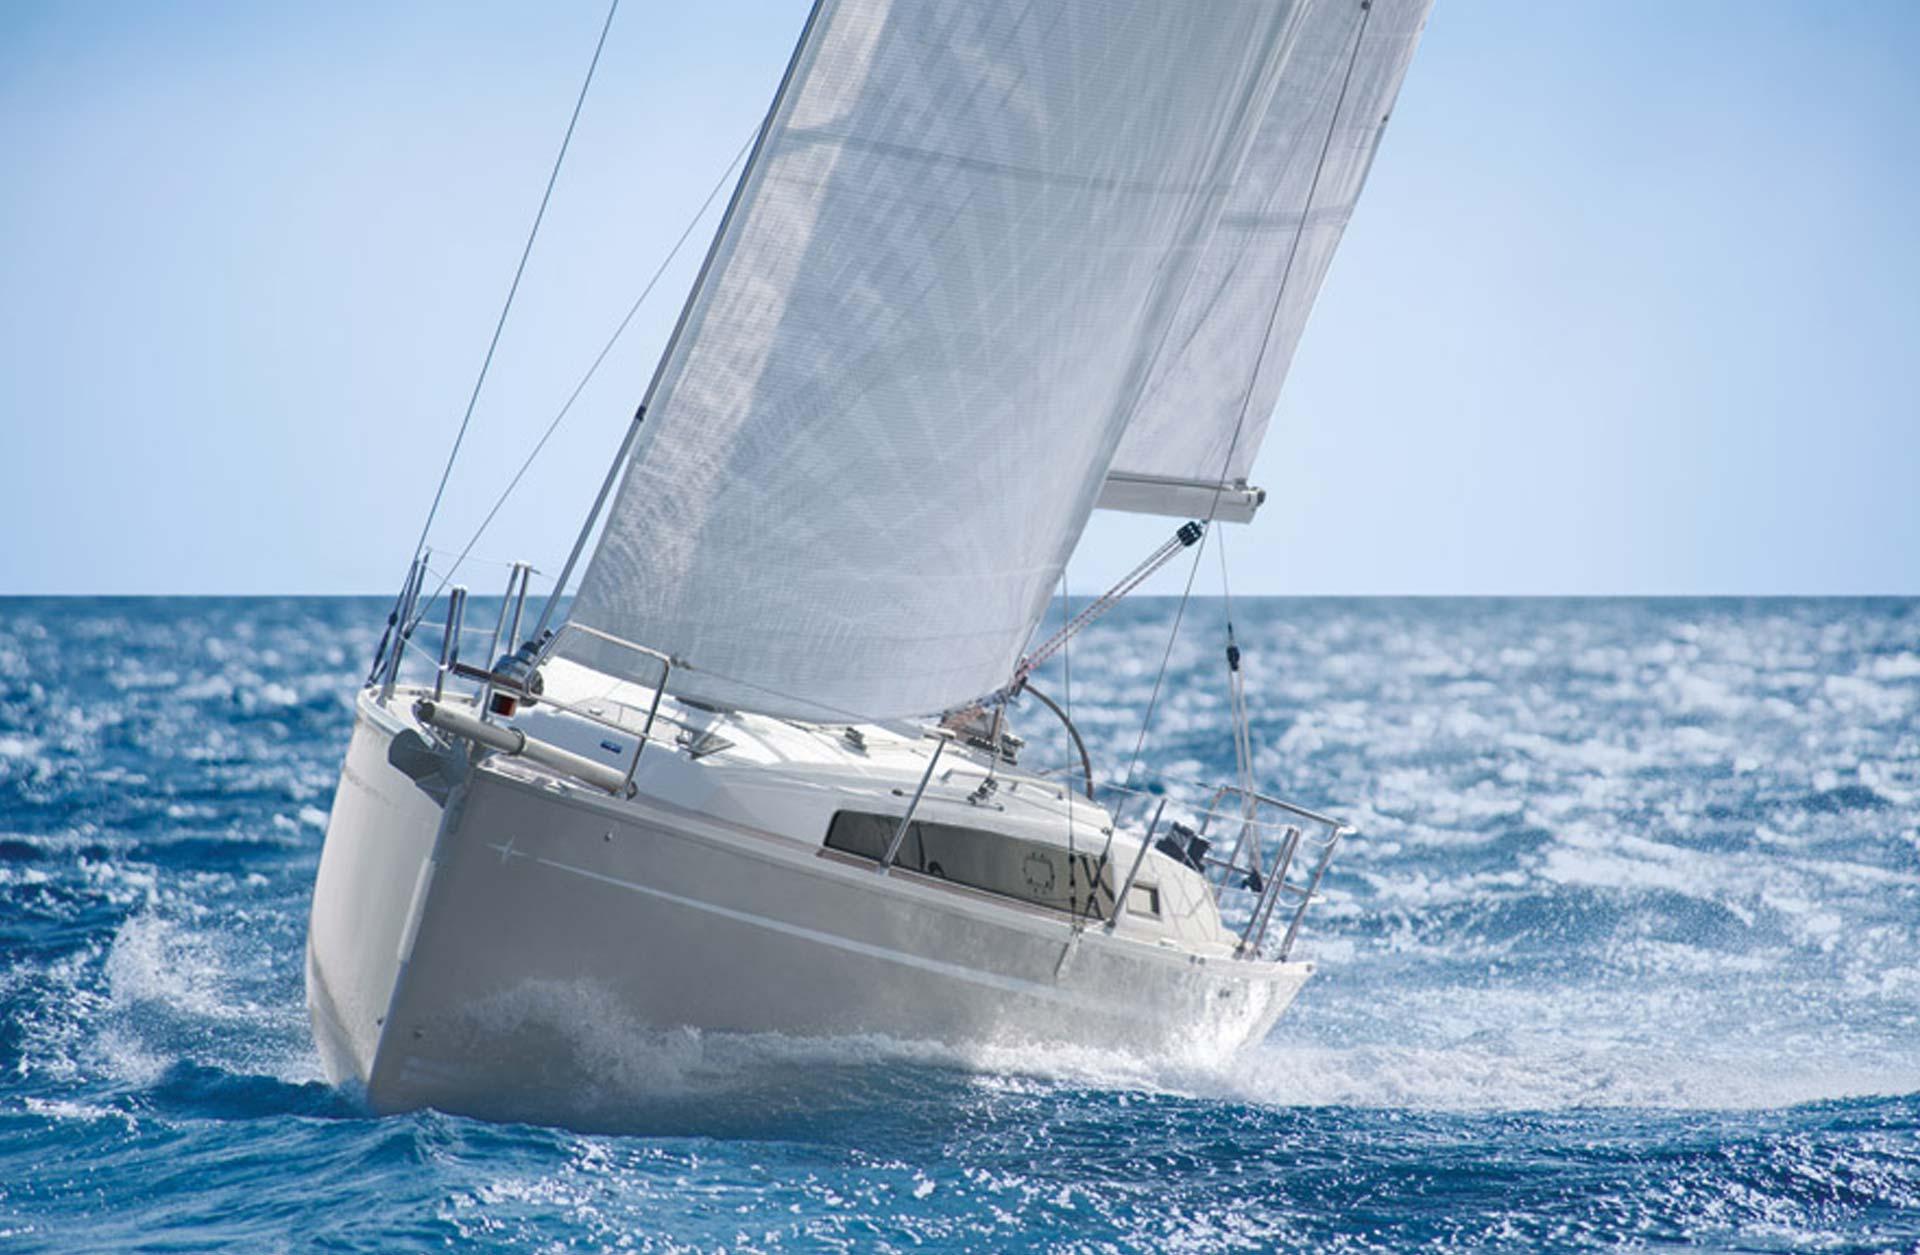 Bavaria Cruiser 51 Boats - EXTERIOR